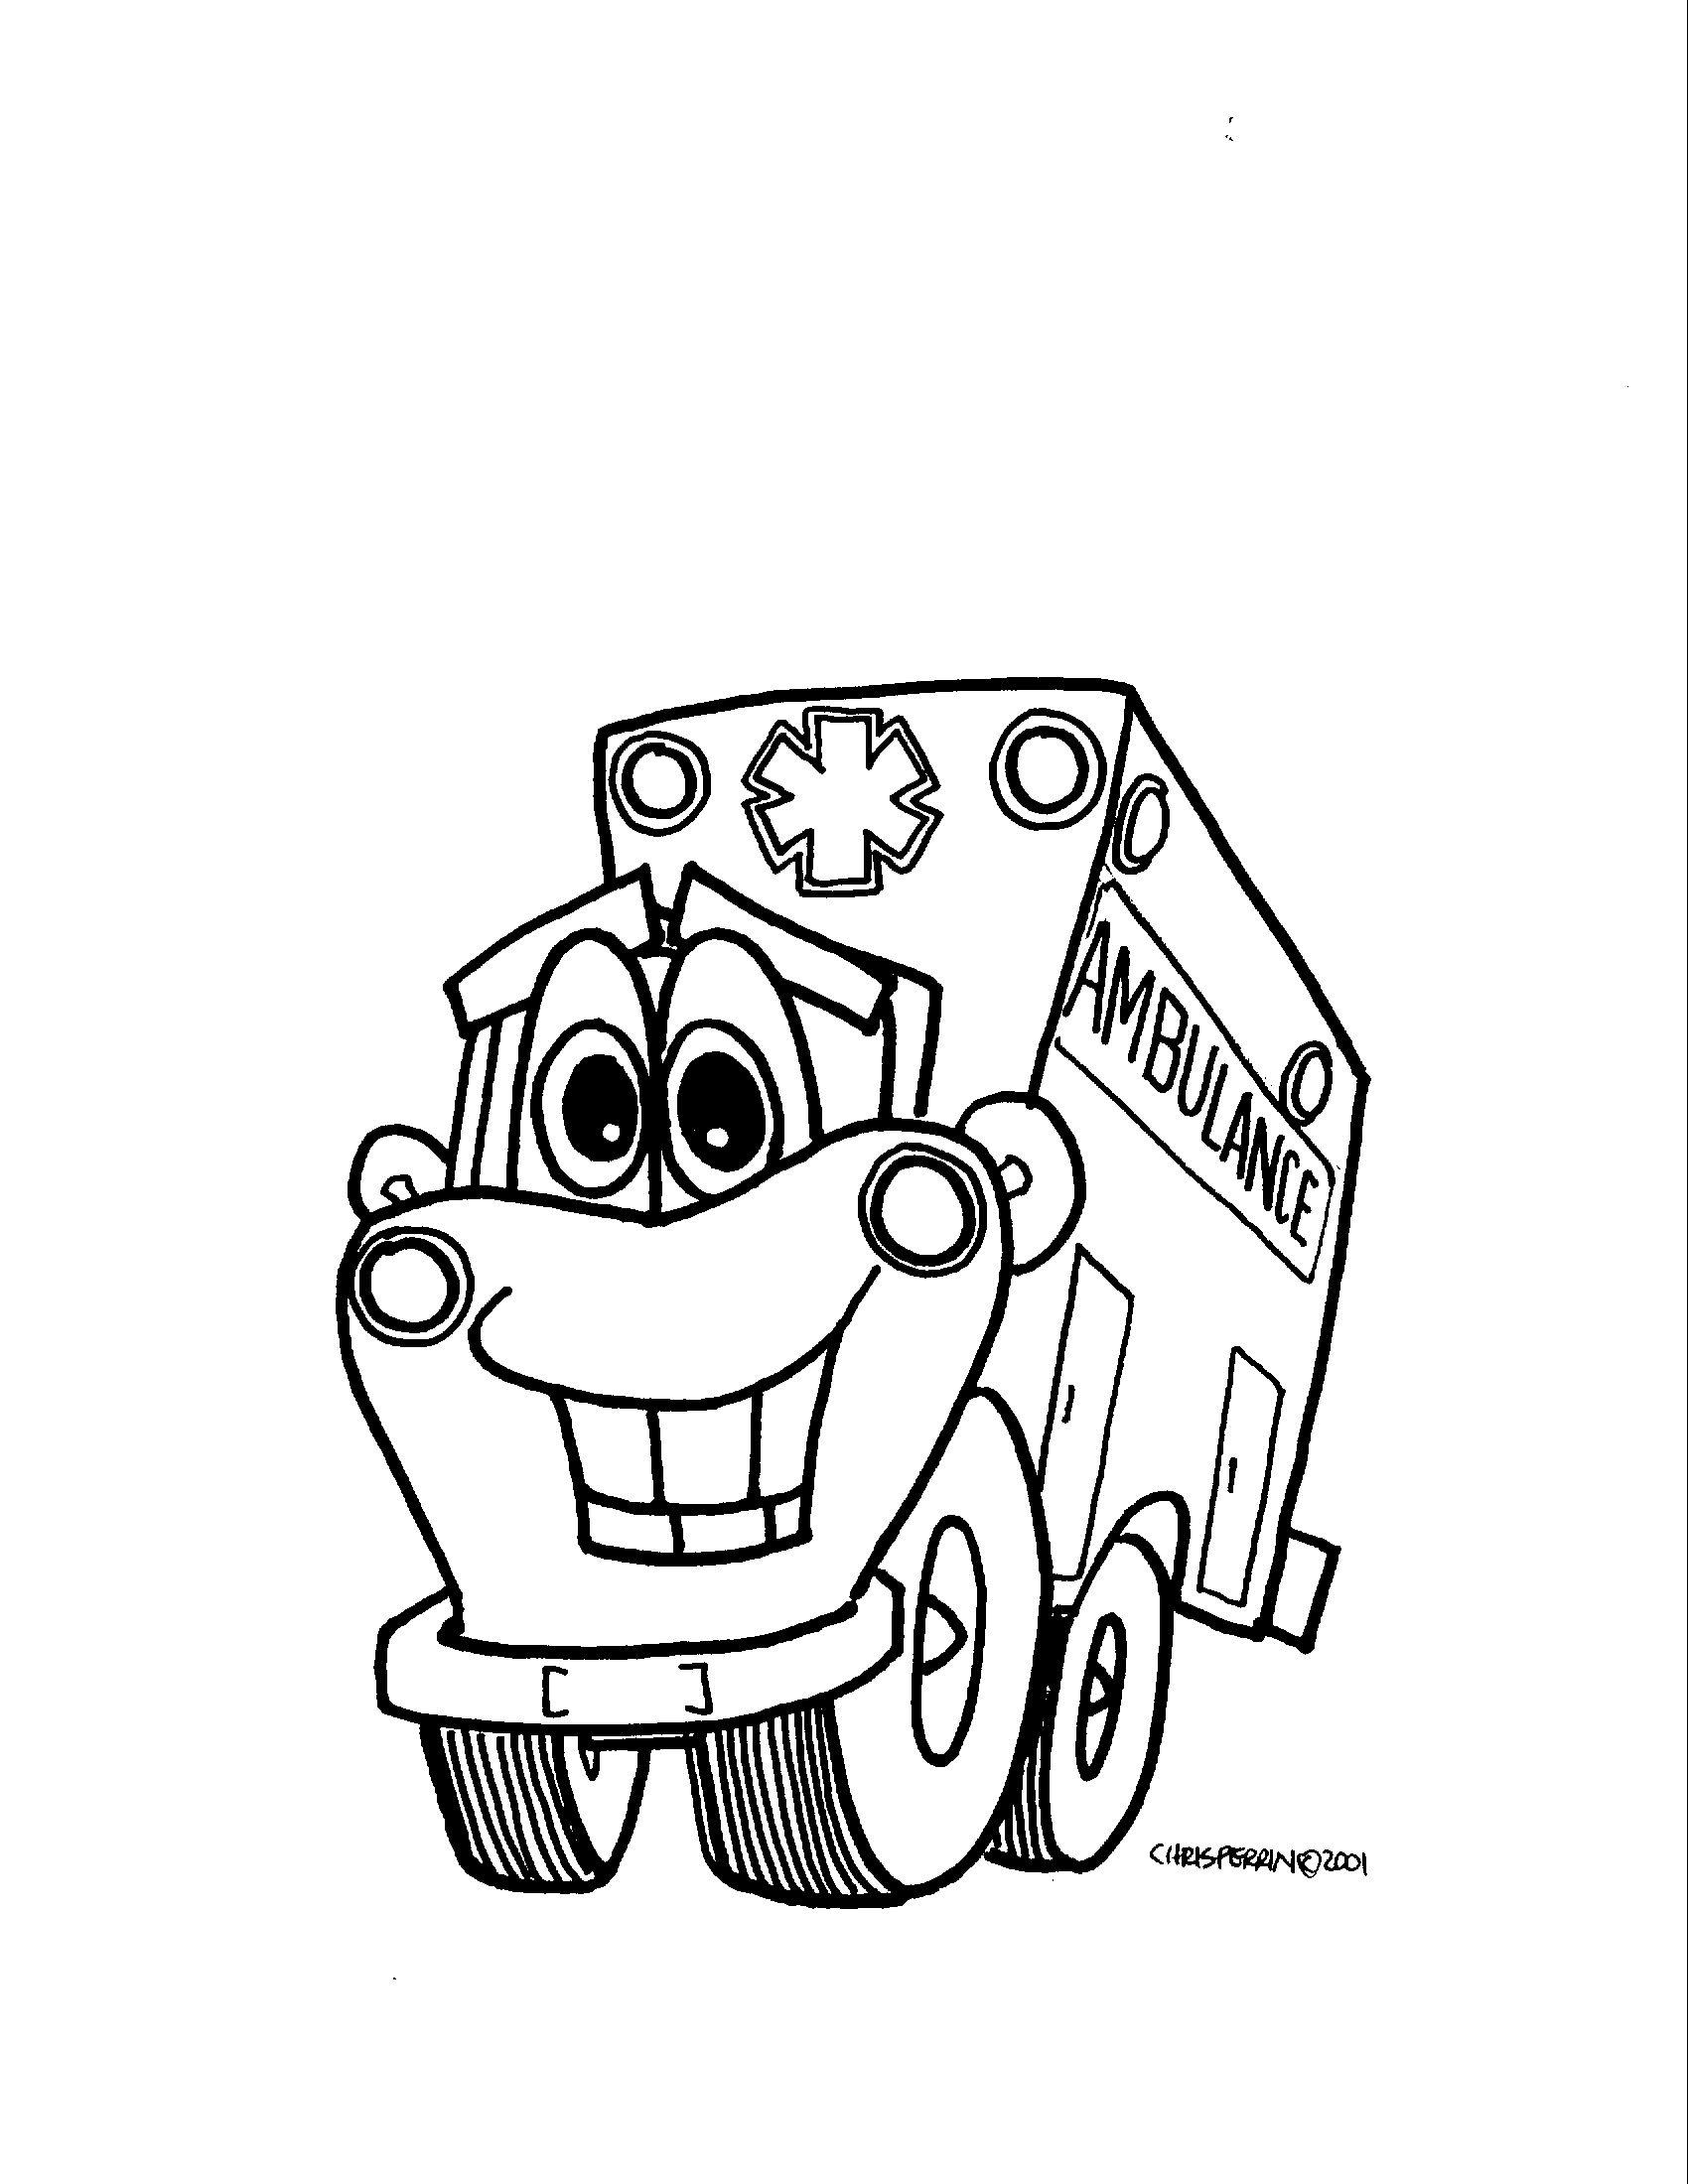 Ambulance Coloring Pages Printable | Mission Blitz Ideas | Pinterest ...